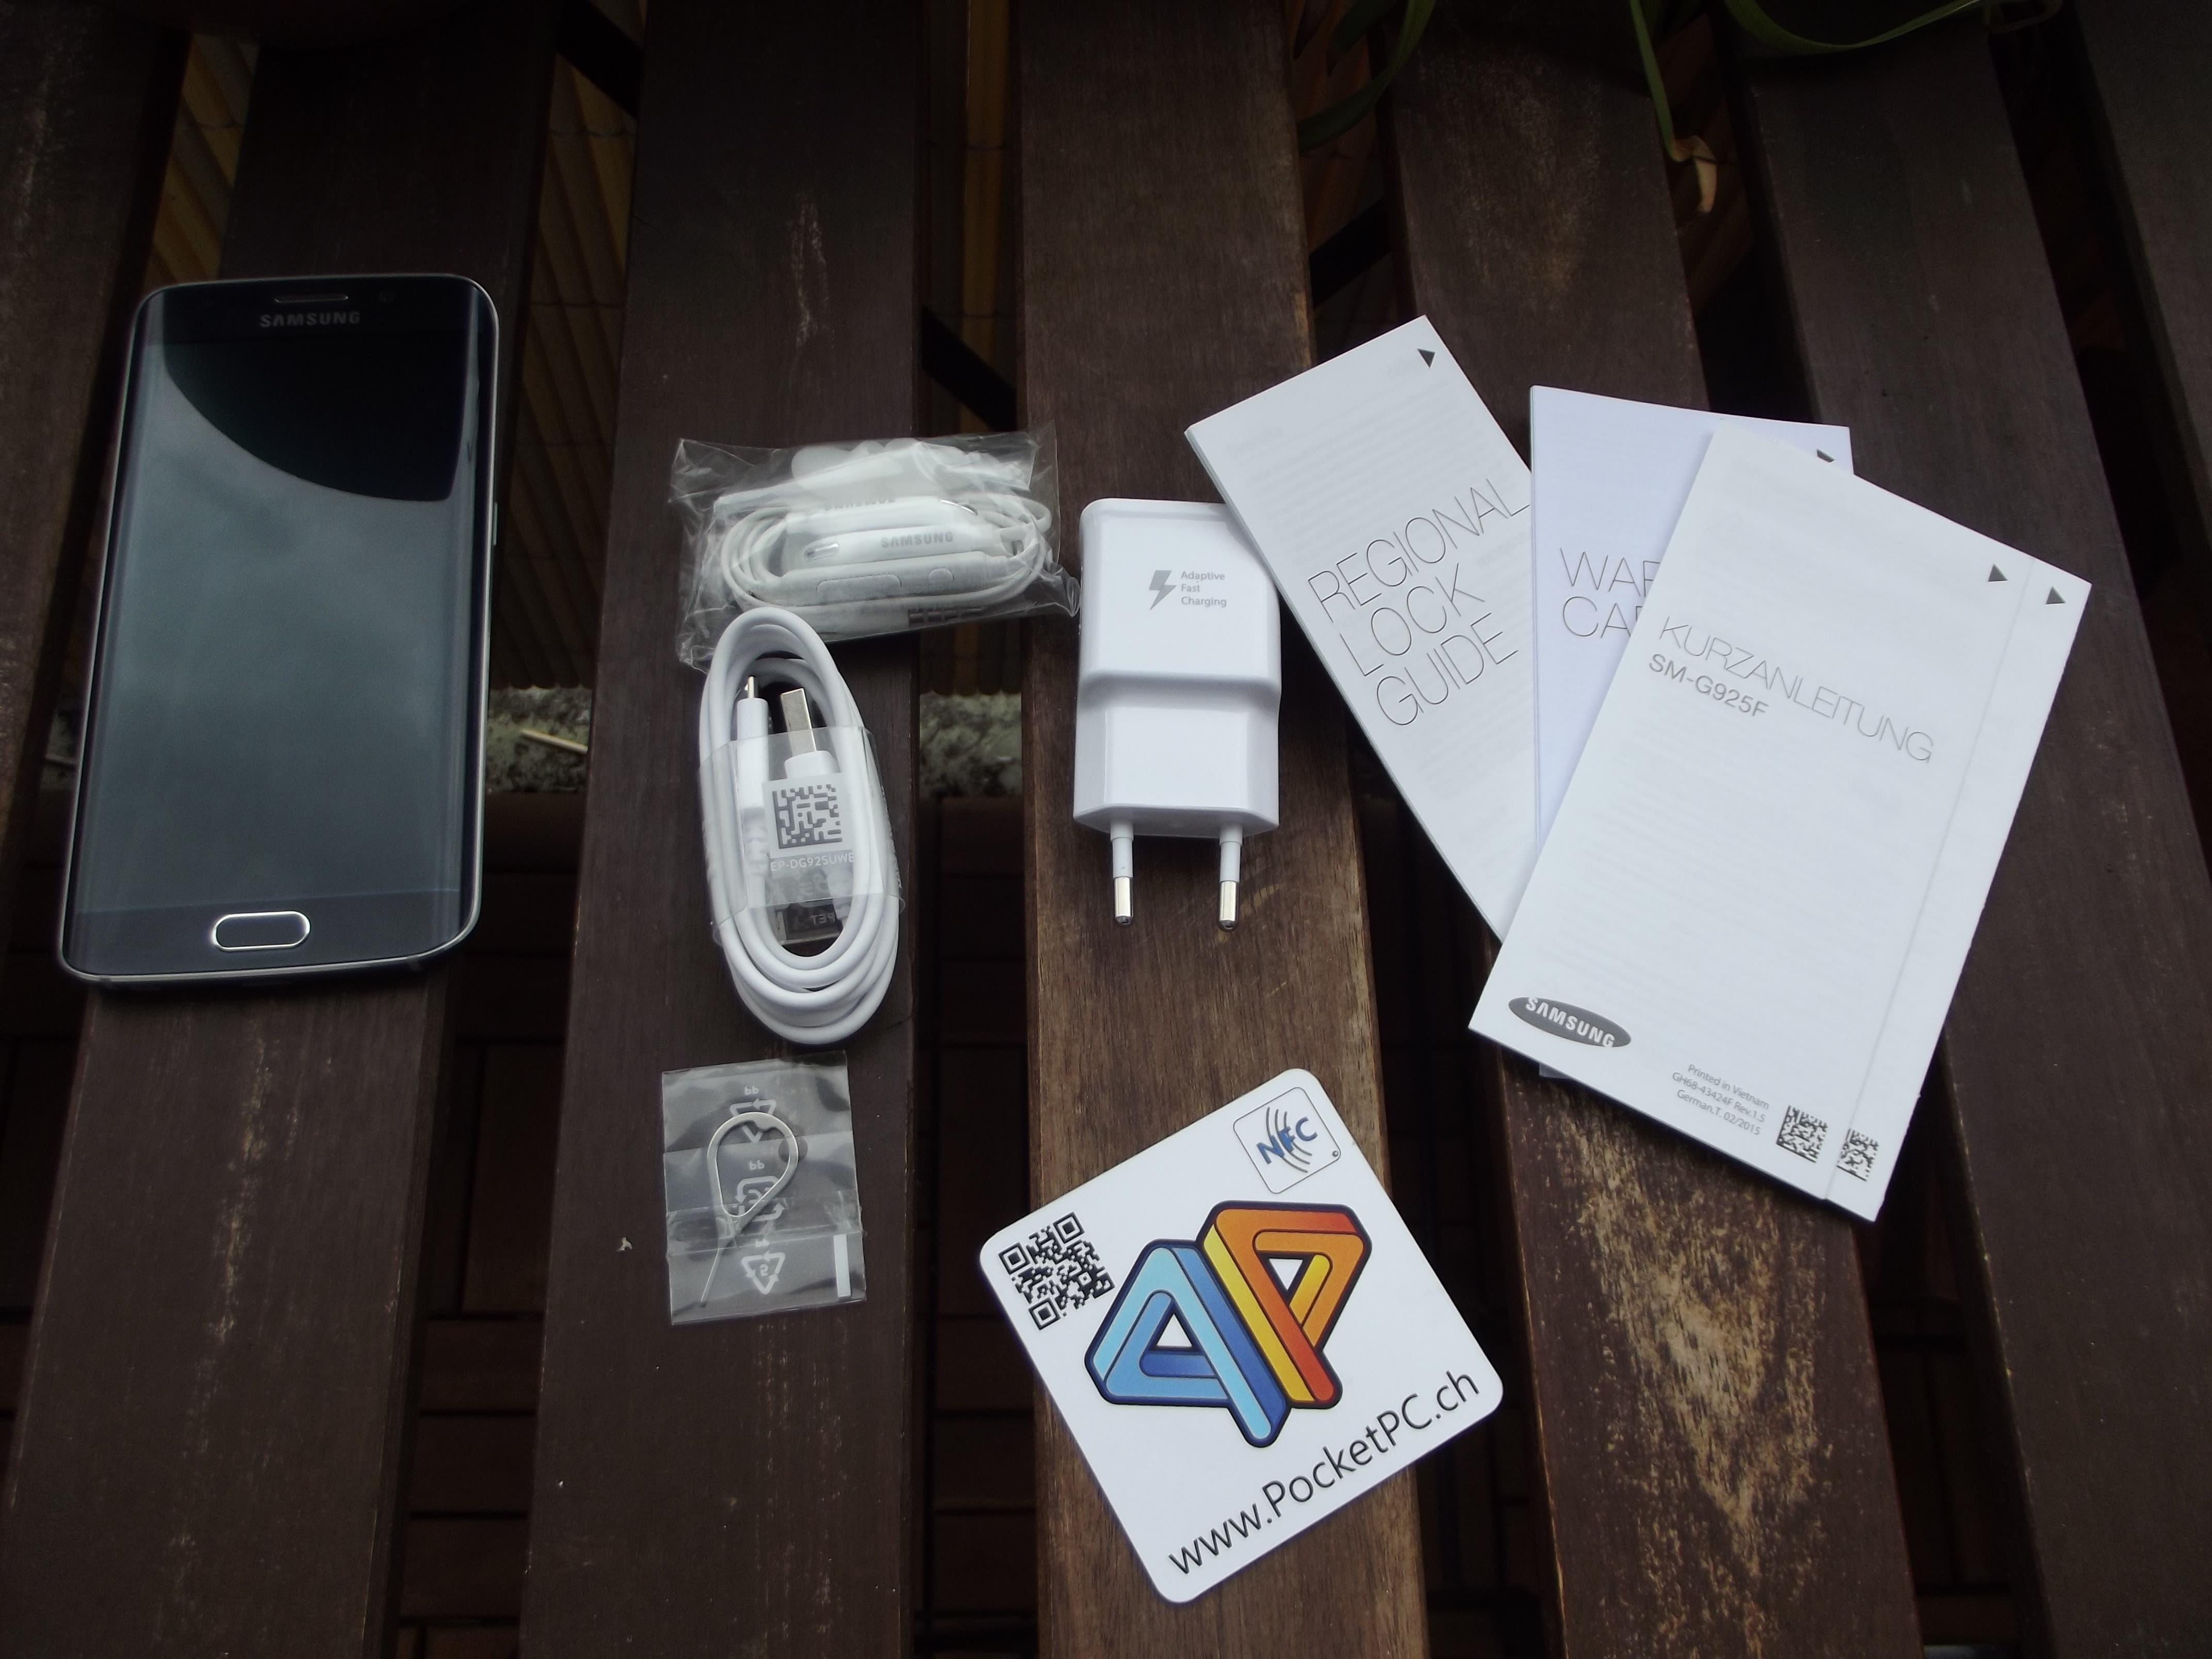 Samsung Galaxy S6 edge Lieferumfang